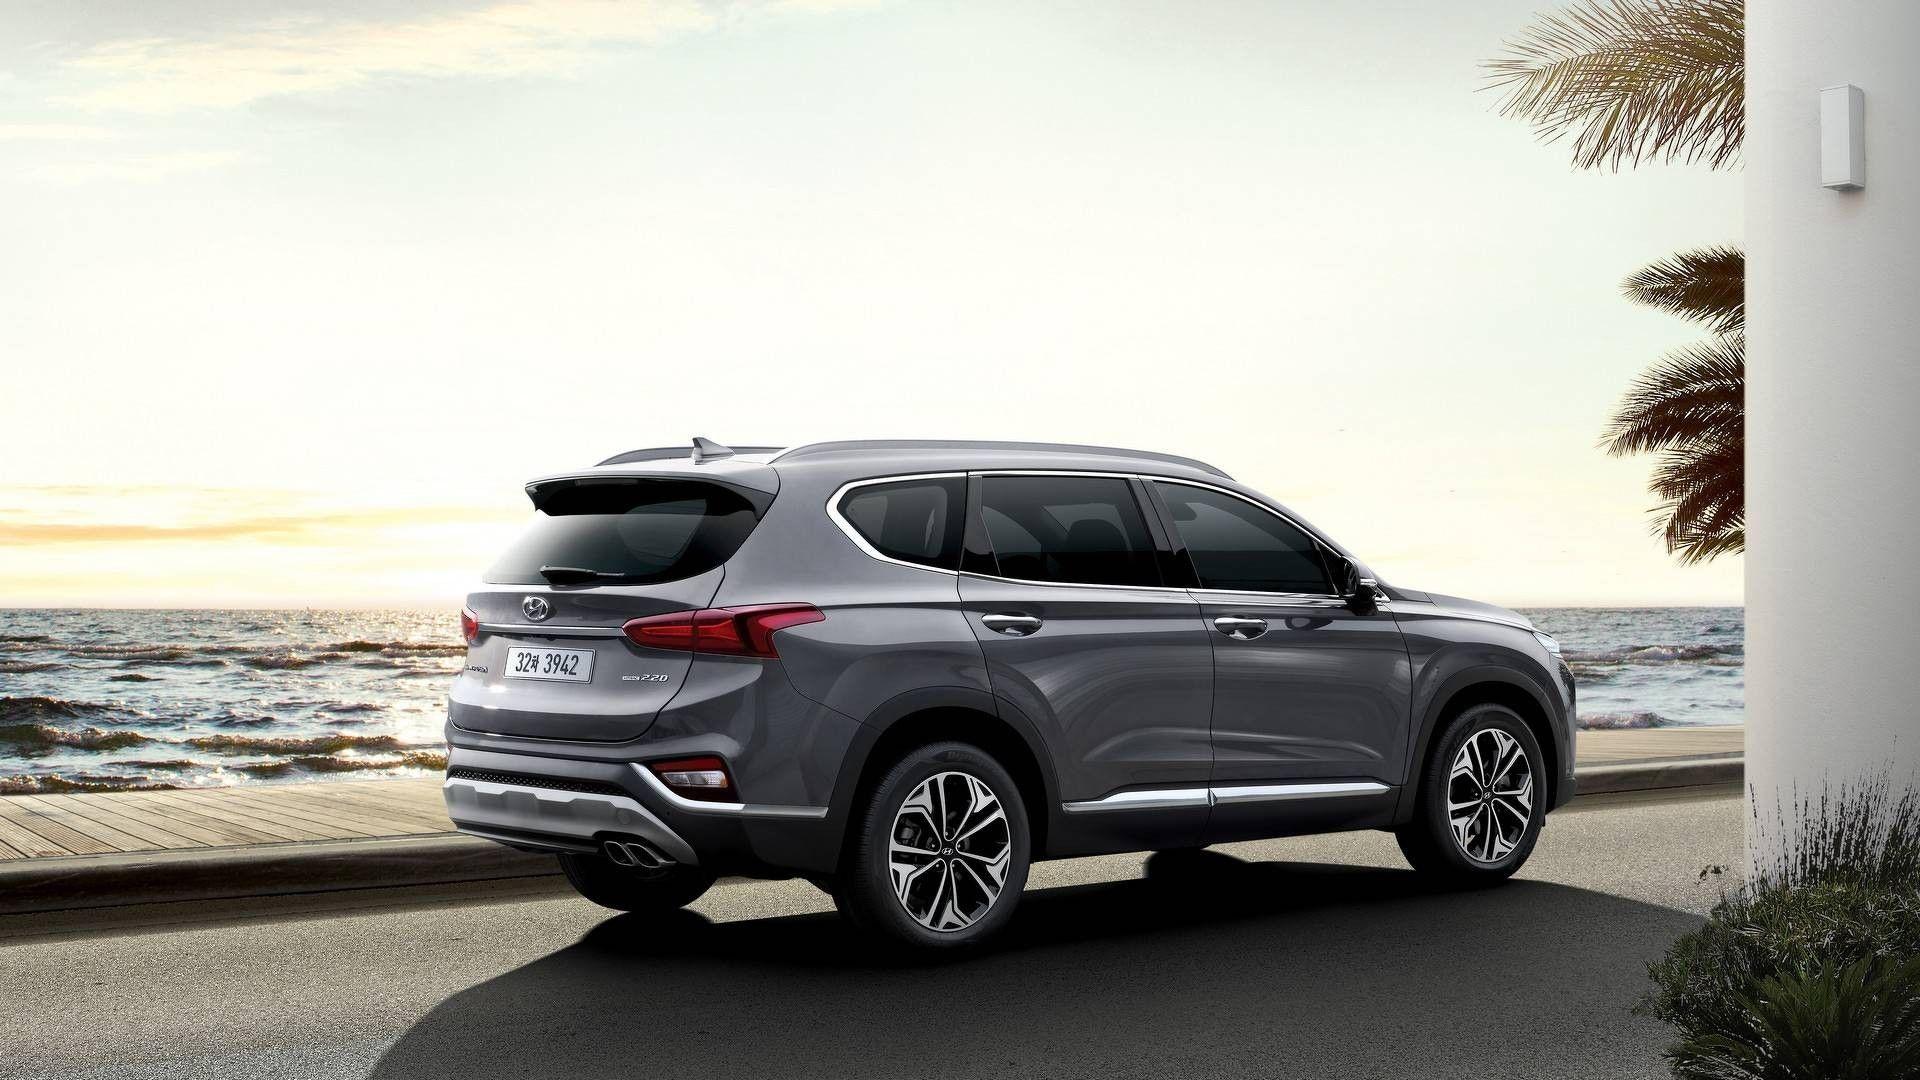 Santa Fe Suv >> Nuova Hyundai Santa Fe: interni, motori, prezzi del SUV a 7 posti - MotorBox